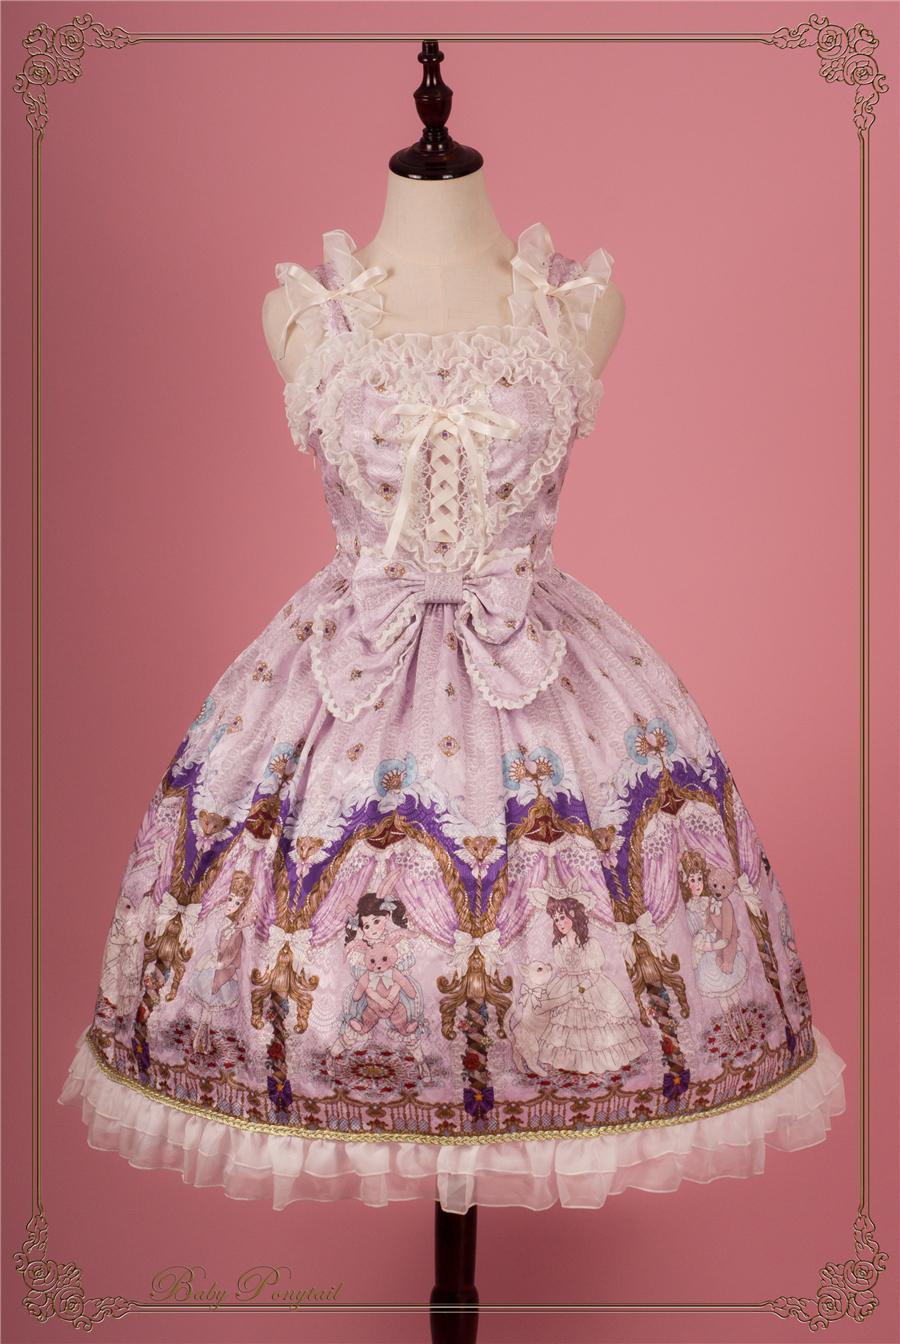 BabyPonytail_Stock Photo_My Favorite Companion_JSK Lavender_0.jpg